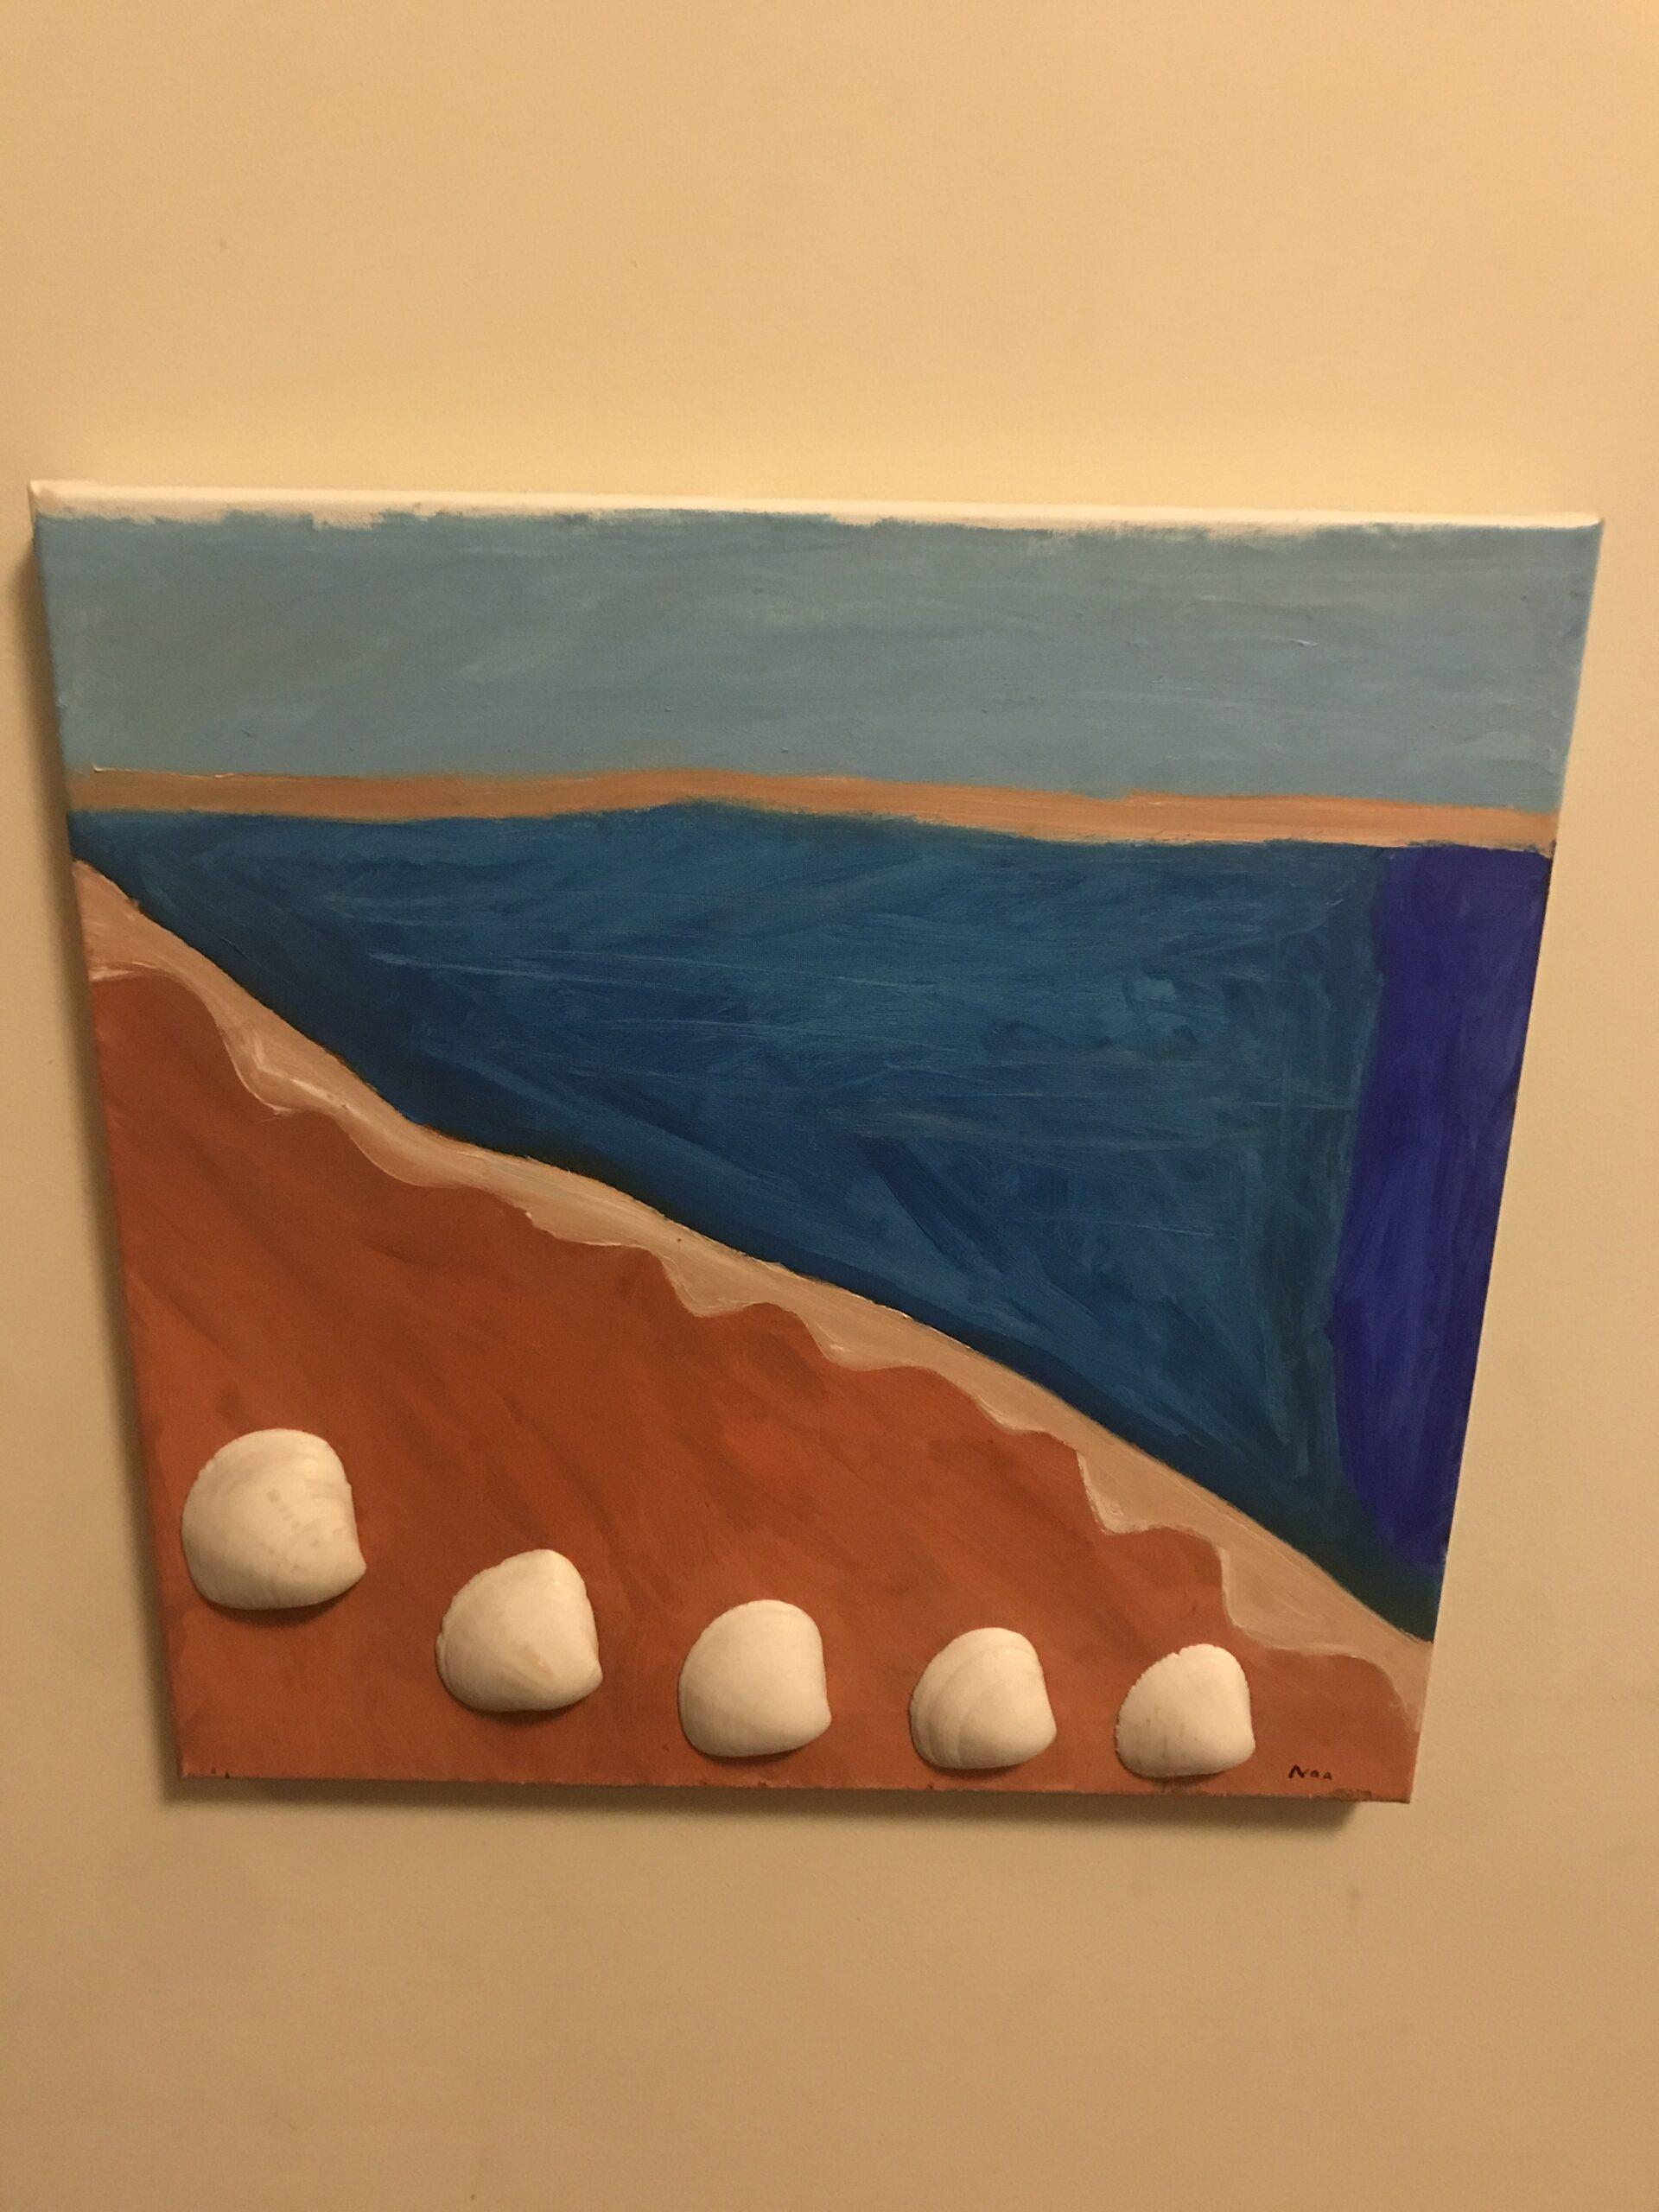 Shells by the Sea by Noa Galea-Ortega